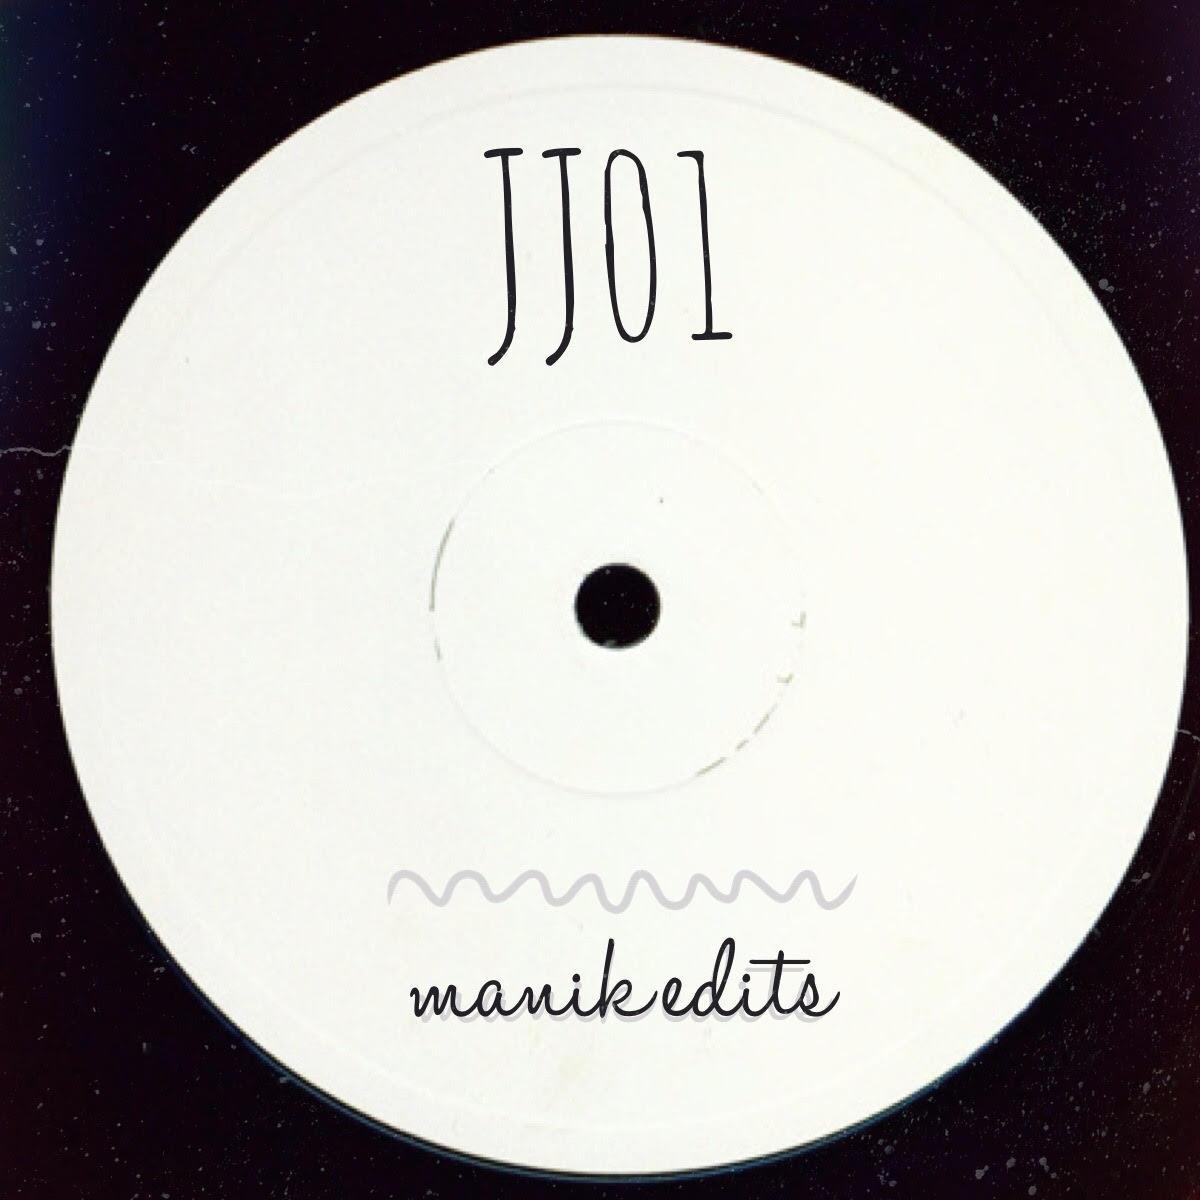 Janet Jackson - JJ01 (MANIK Summer Refix)